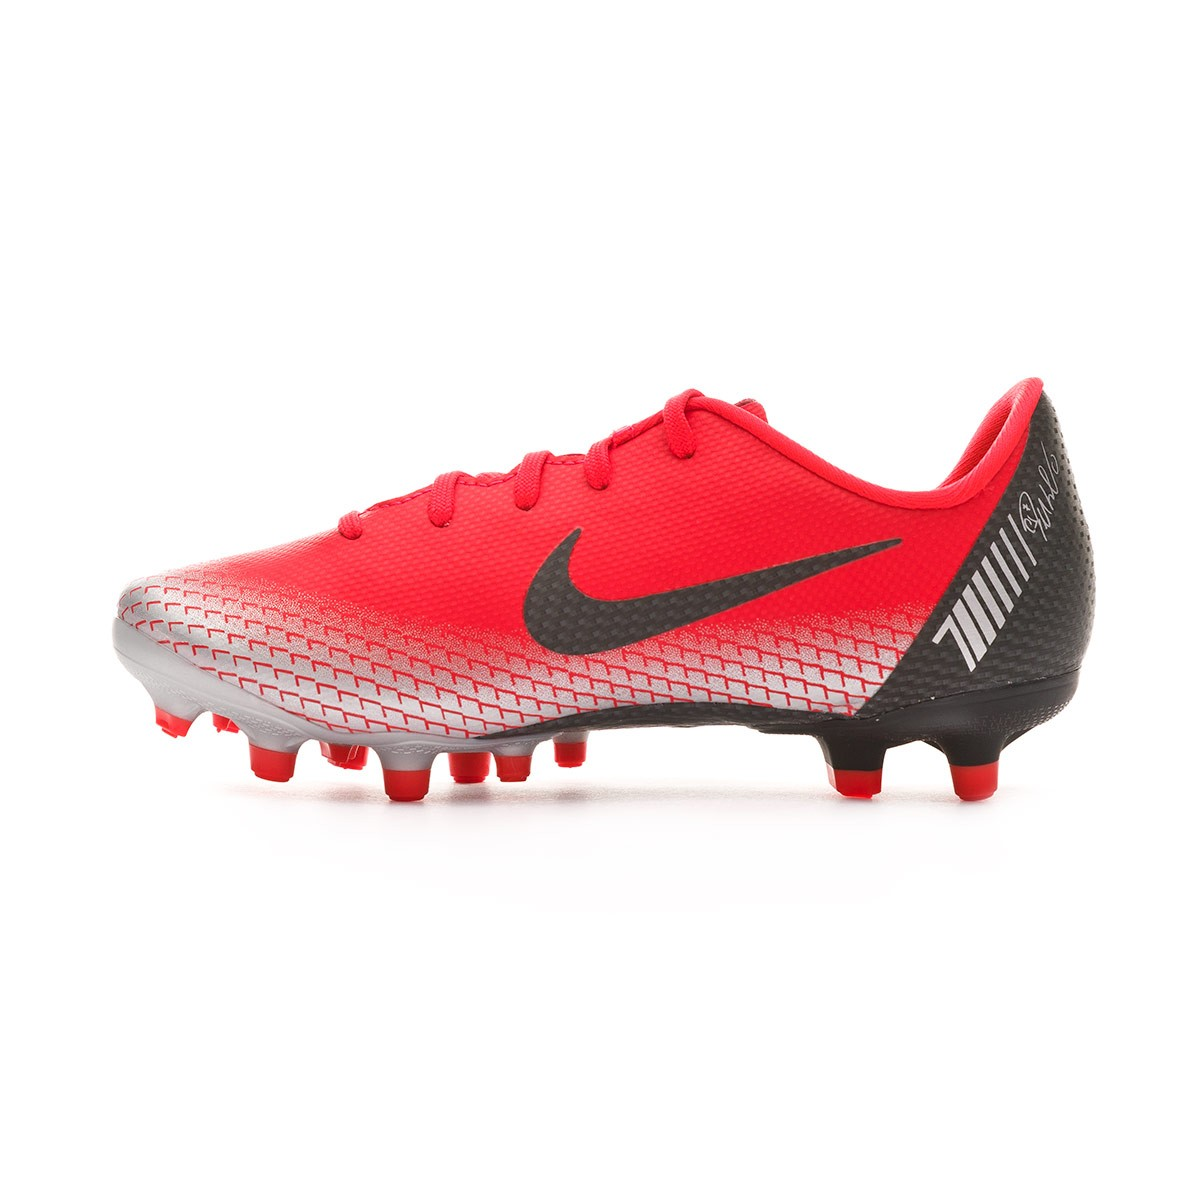 new concept eddb4 ae8bb Chaussure de foot Nike Mercurial Vapor XII Academy MG enfant Bright crimson-Black-Chrome-Dark  grey - Boutique de football Fútbol Emotion